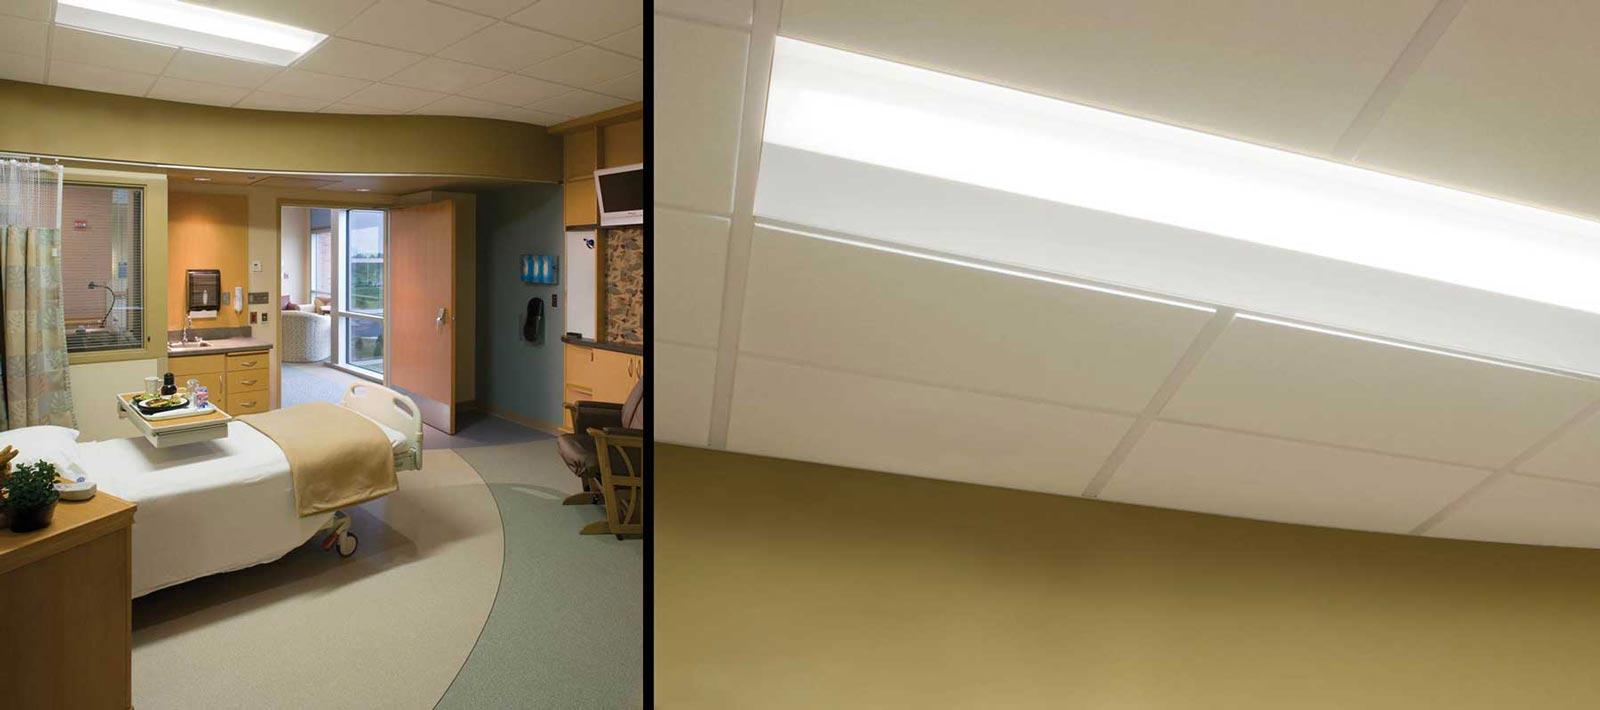 FMA1_stclairehospital_02